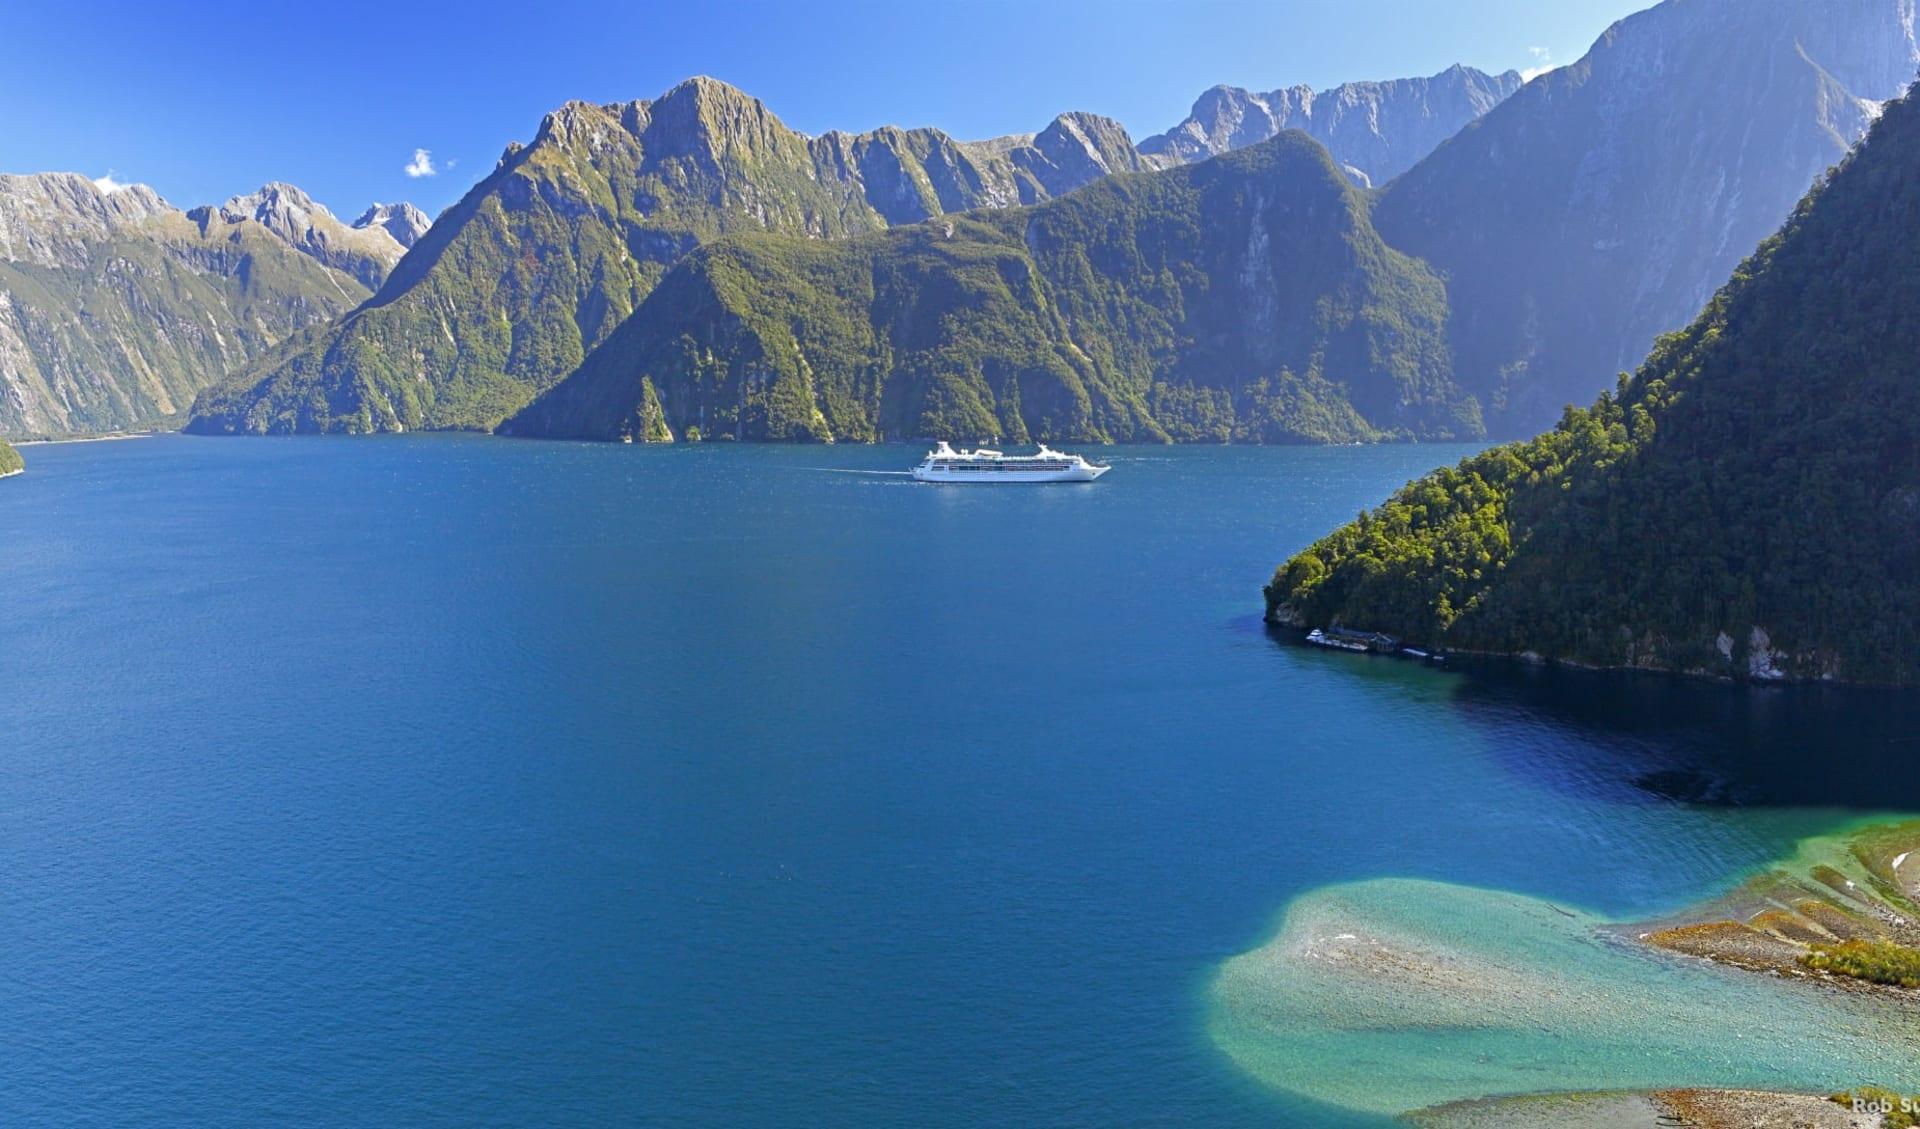 Spektakuläres Neuseeland (AAT Kings) ab Auckland: Neuseeland - Südinsel - Milford Sounds